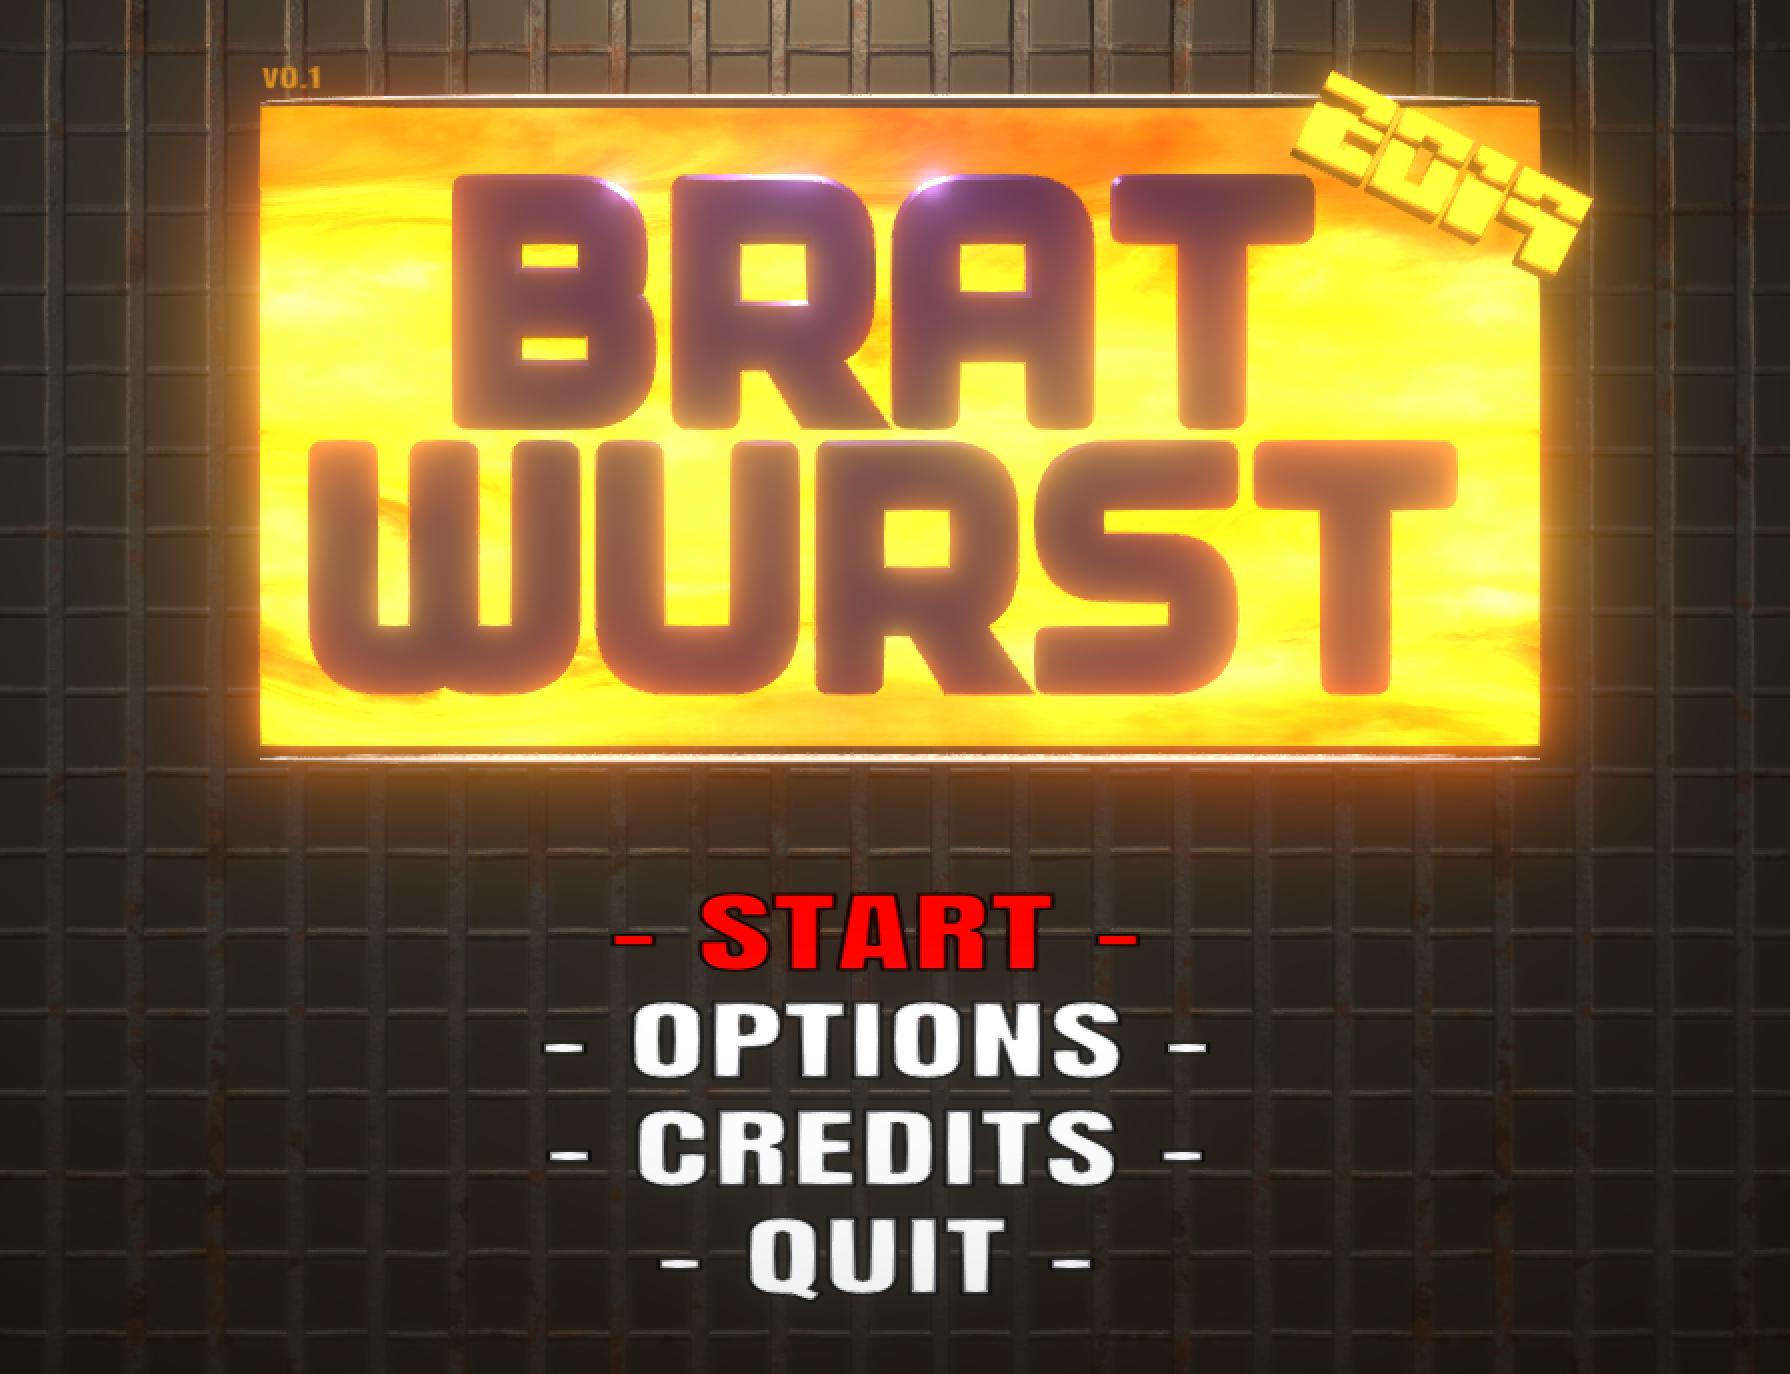 Bratwurst 2019